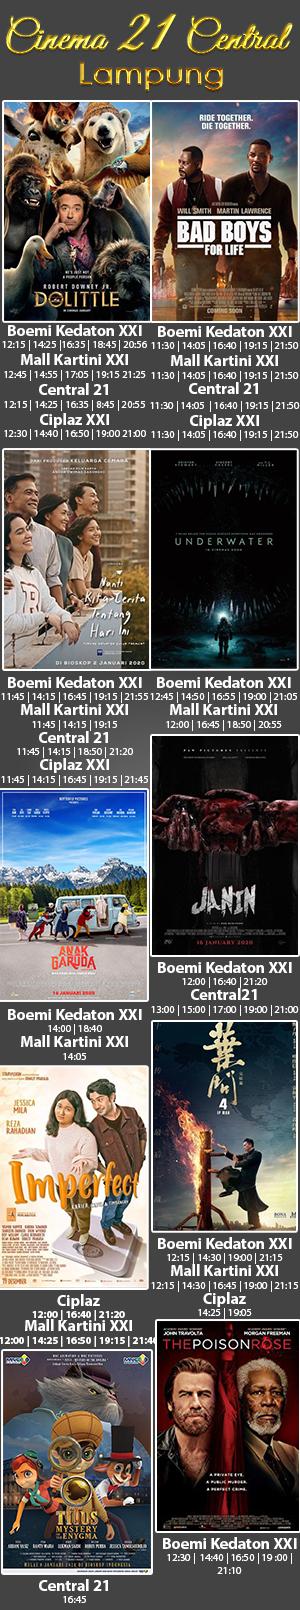 Jadwal Nonton Lampung